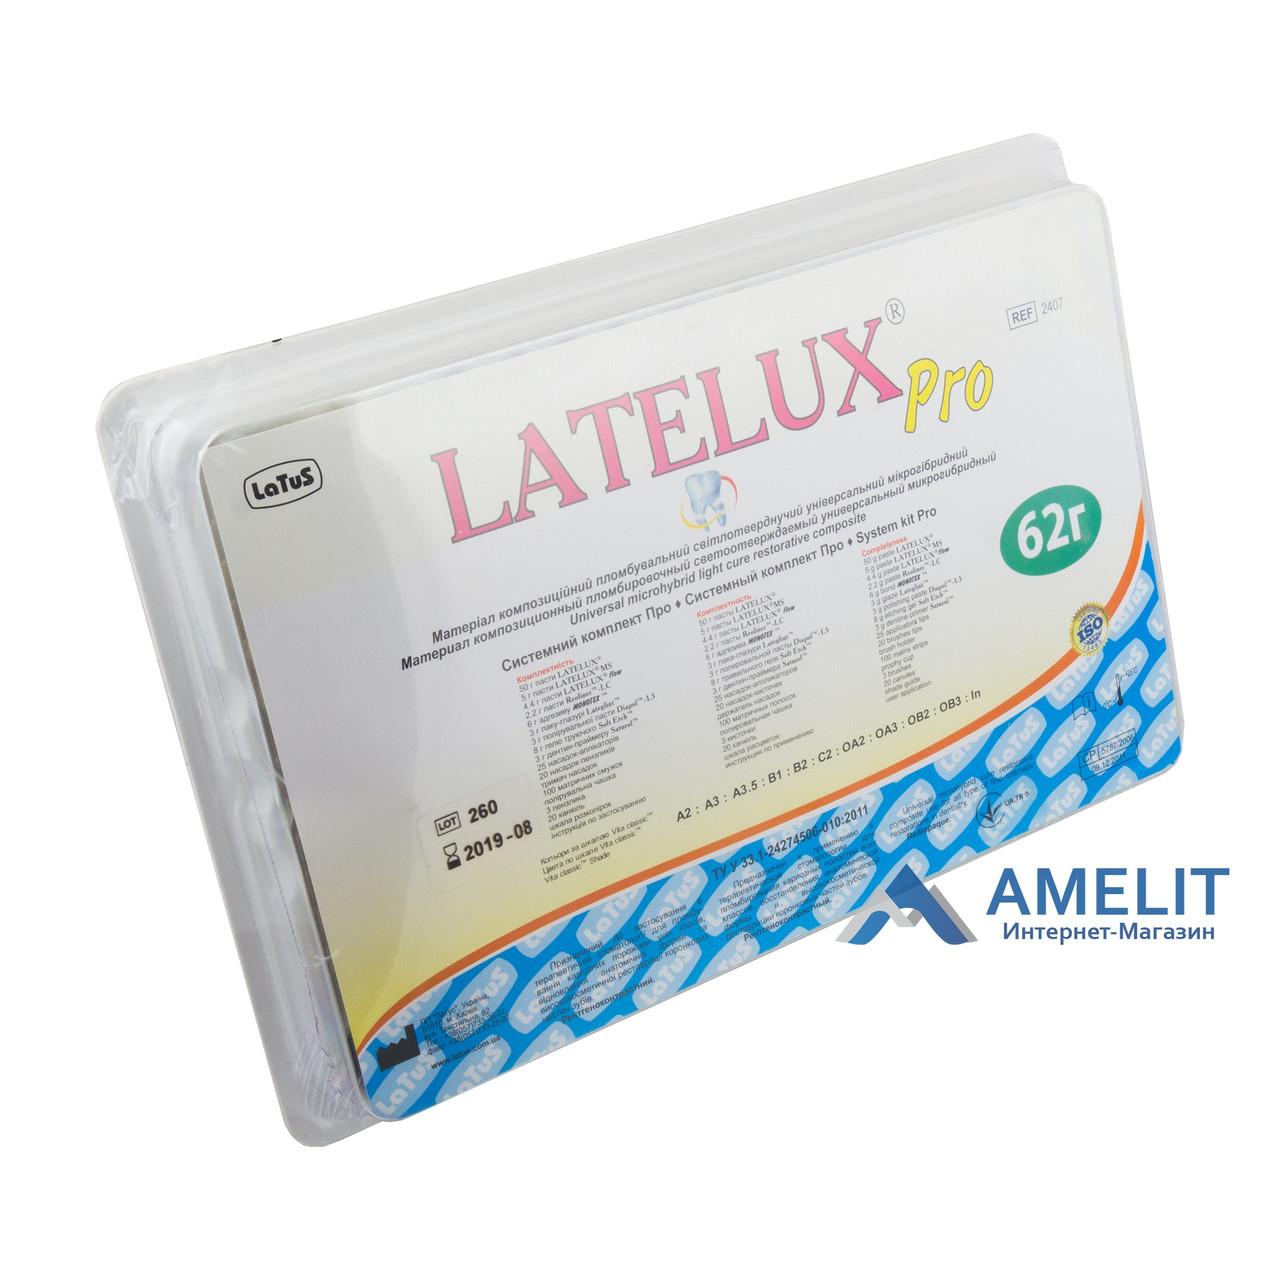 Лателюкс Про (LATELUX PRO, Латус), набор, 14 шприцов – 62г + аксессуары